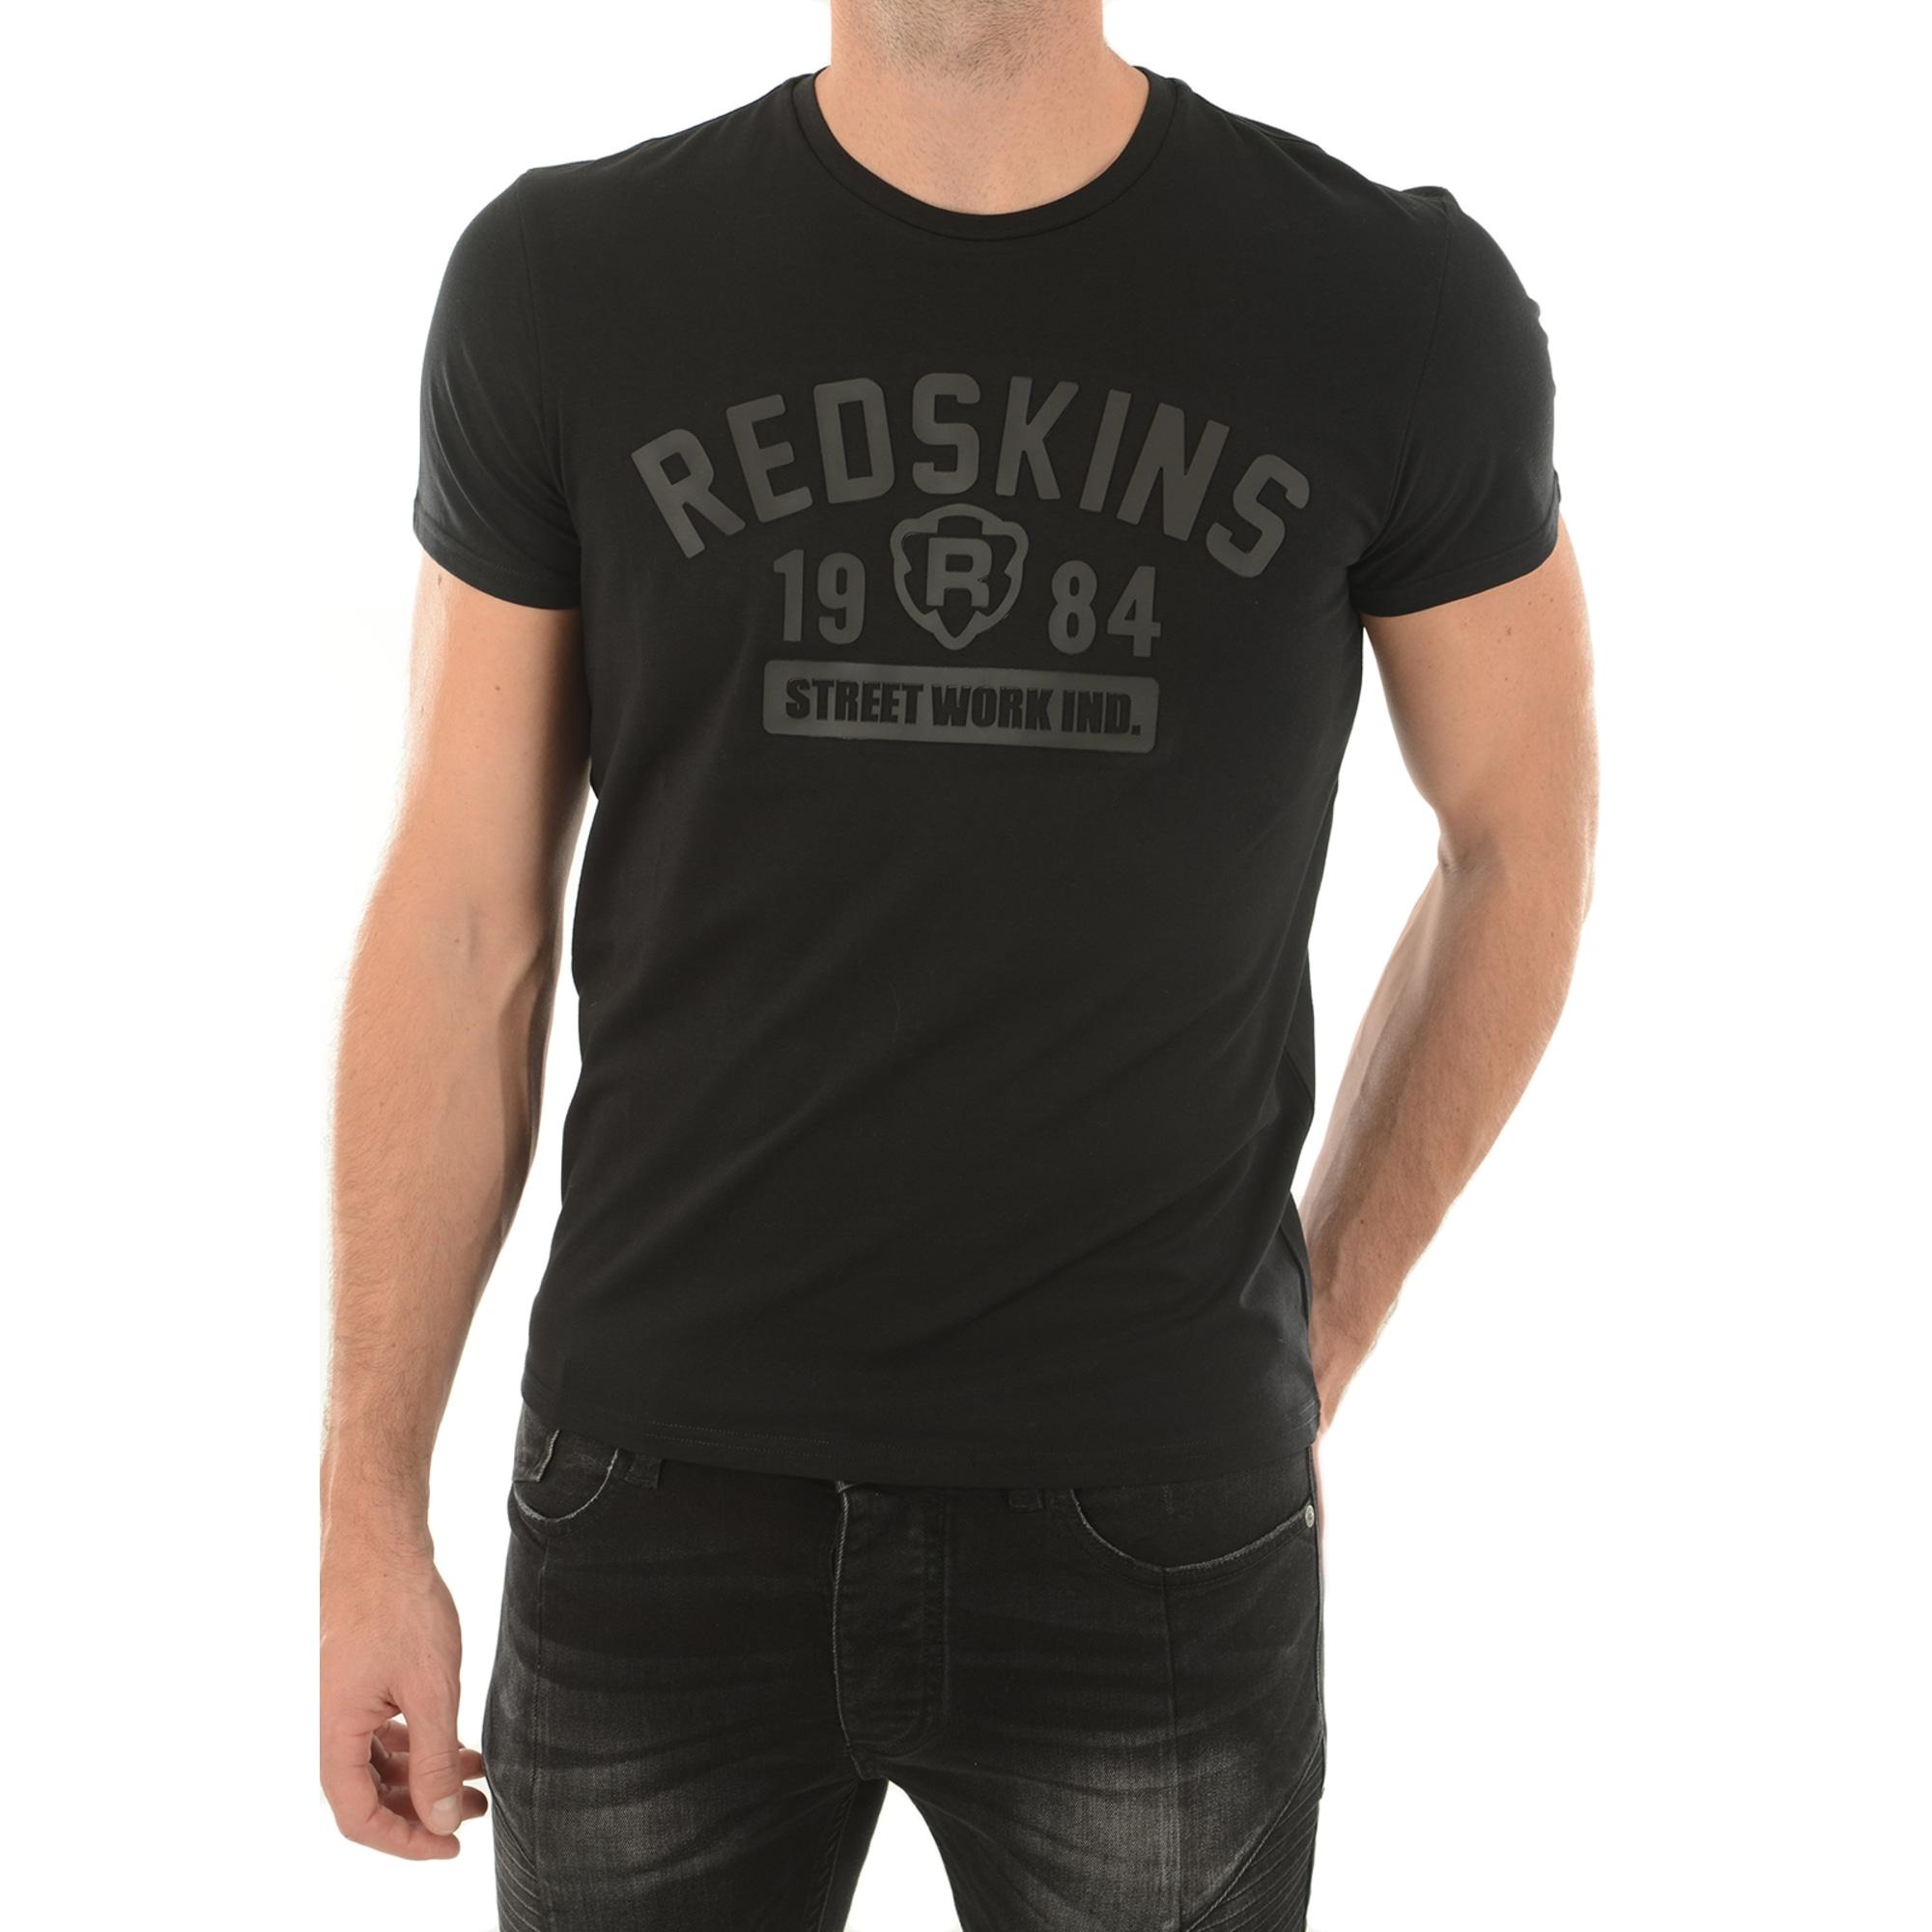 72dce2b6 Tee-shirt